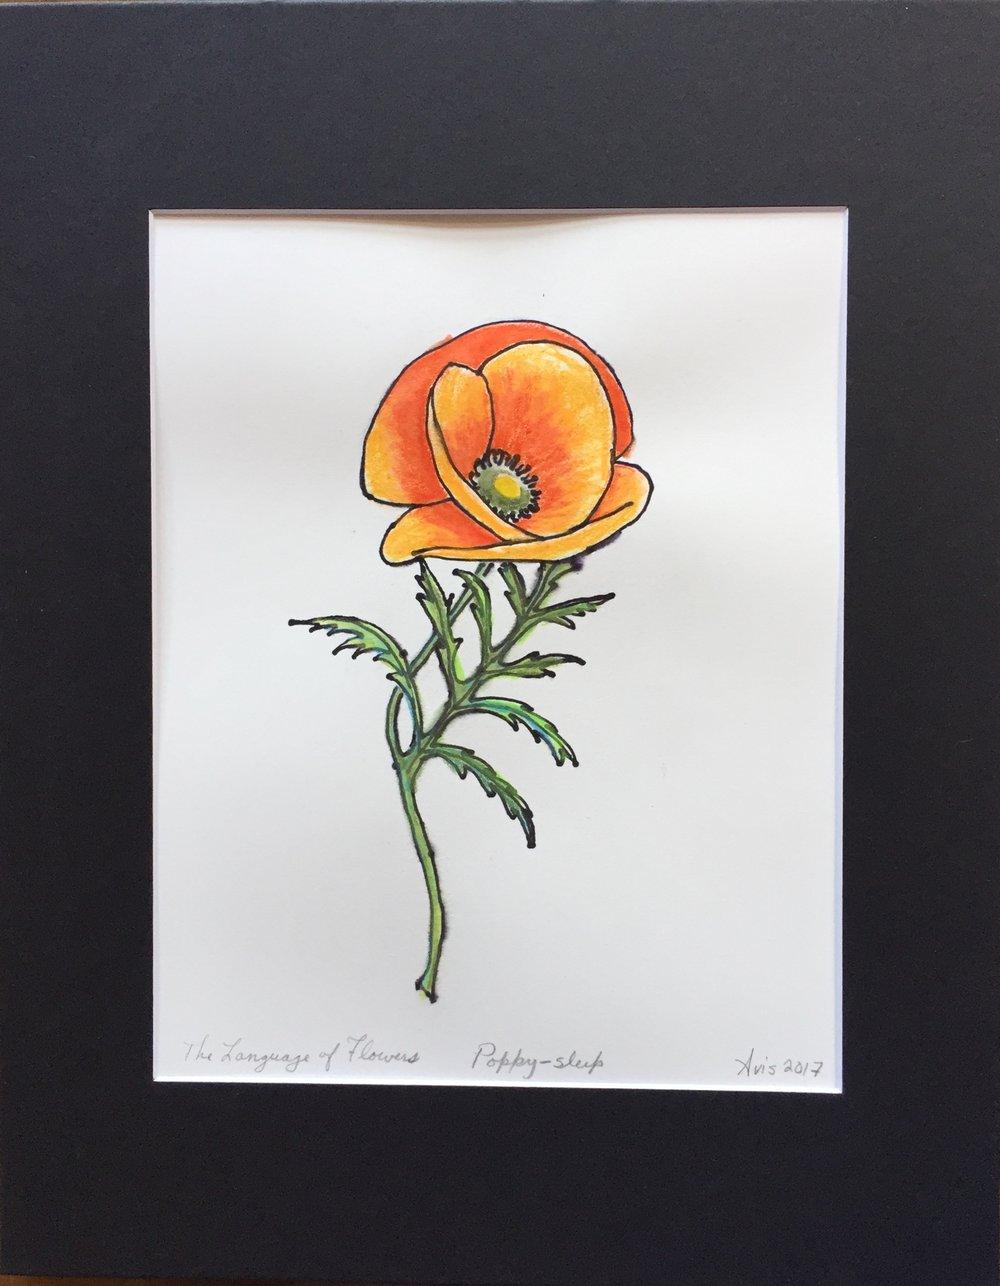 The Language of Flowers, Poppy-Sleep